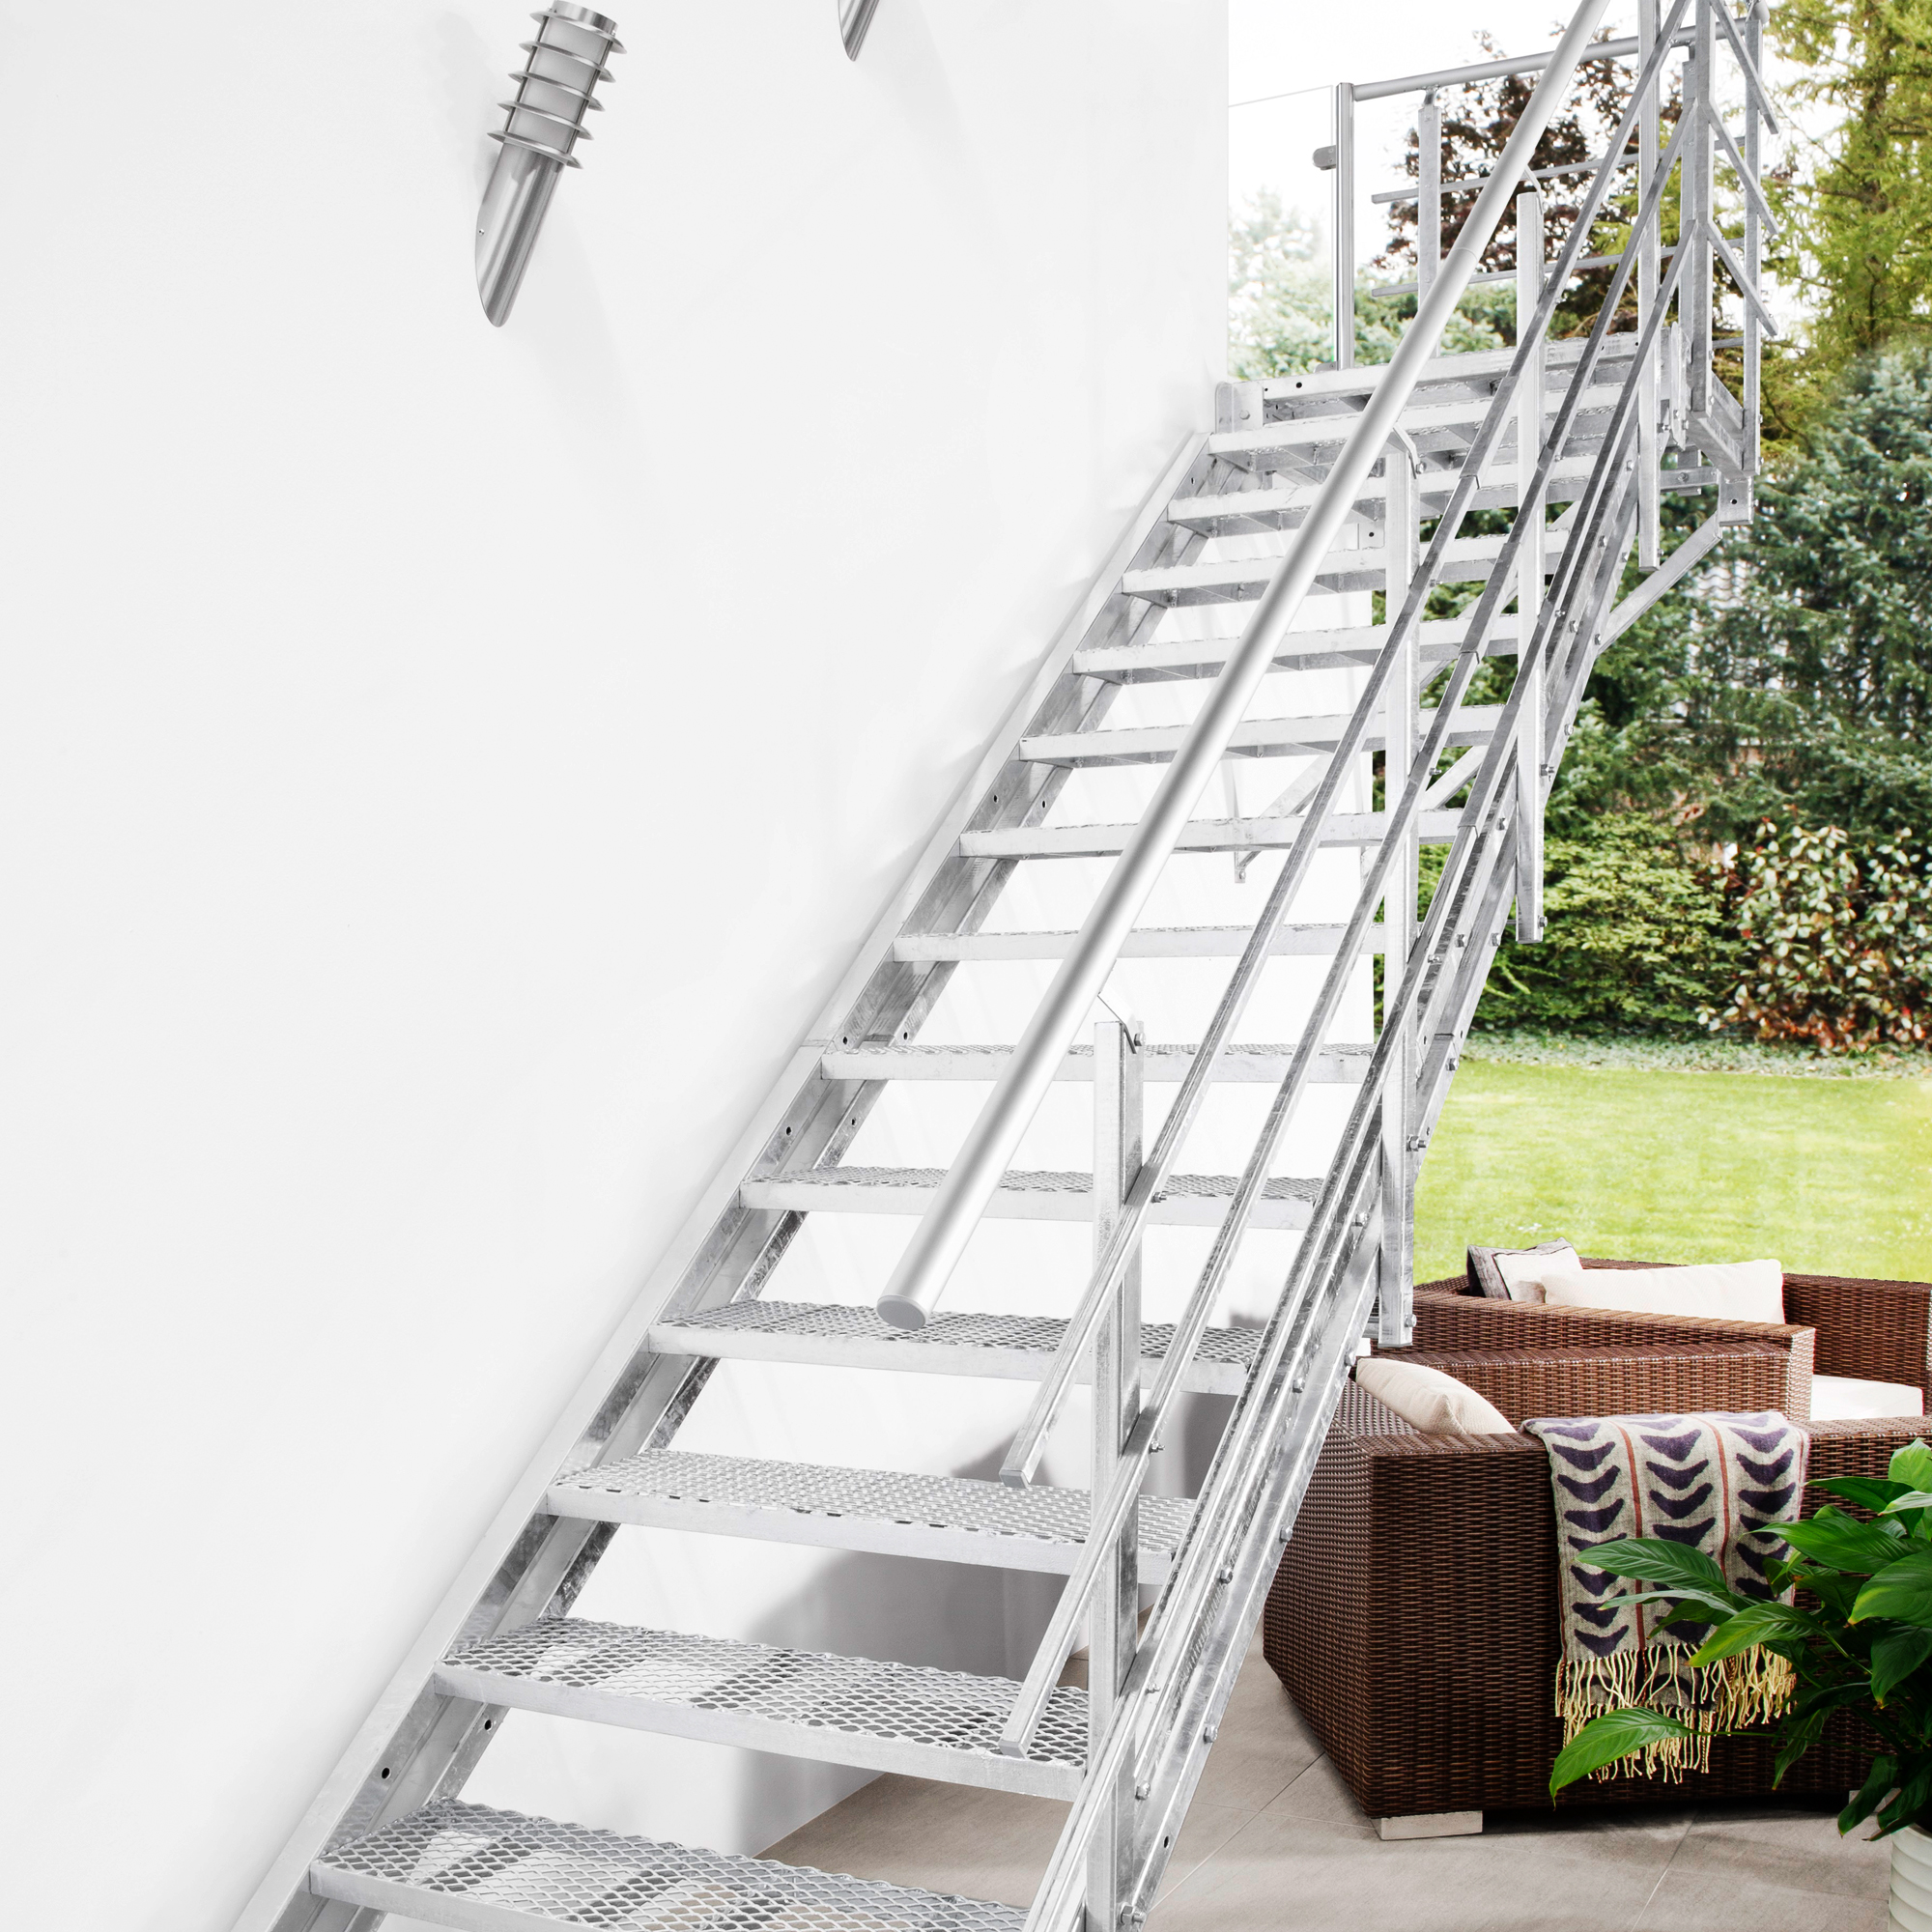 au entreppe mit podest g nstig als bausatz kaufen treppen. Black Bedroom Furniture Sets. Home Design Ideas